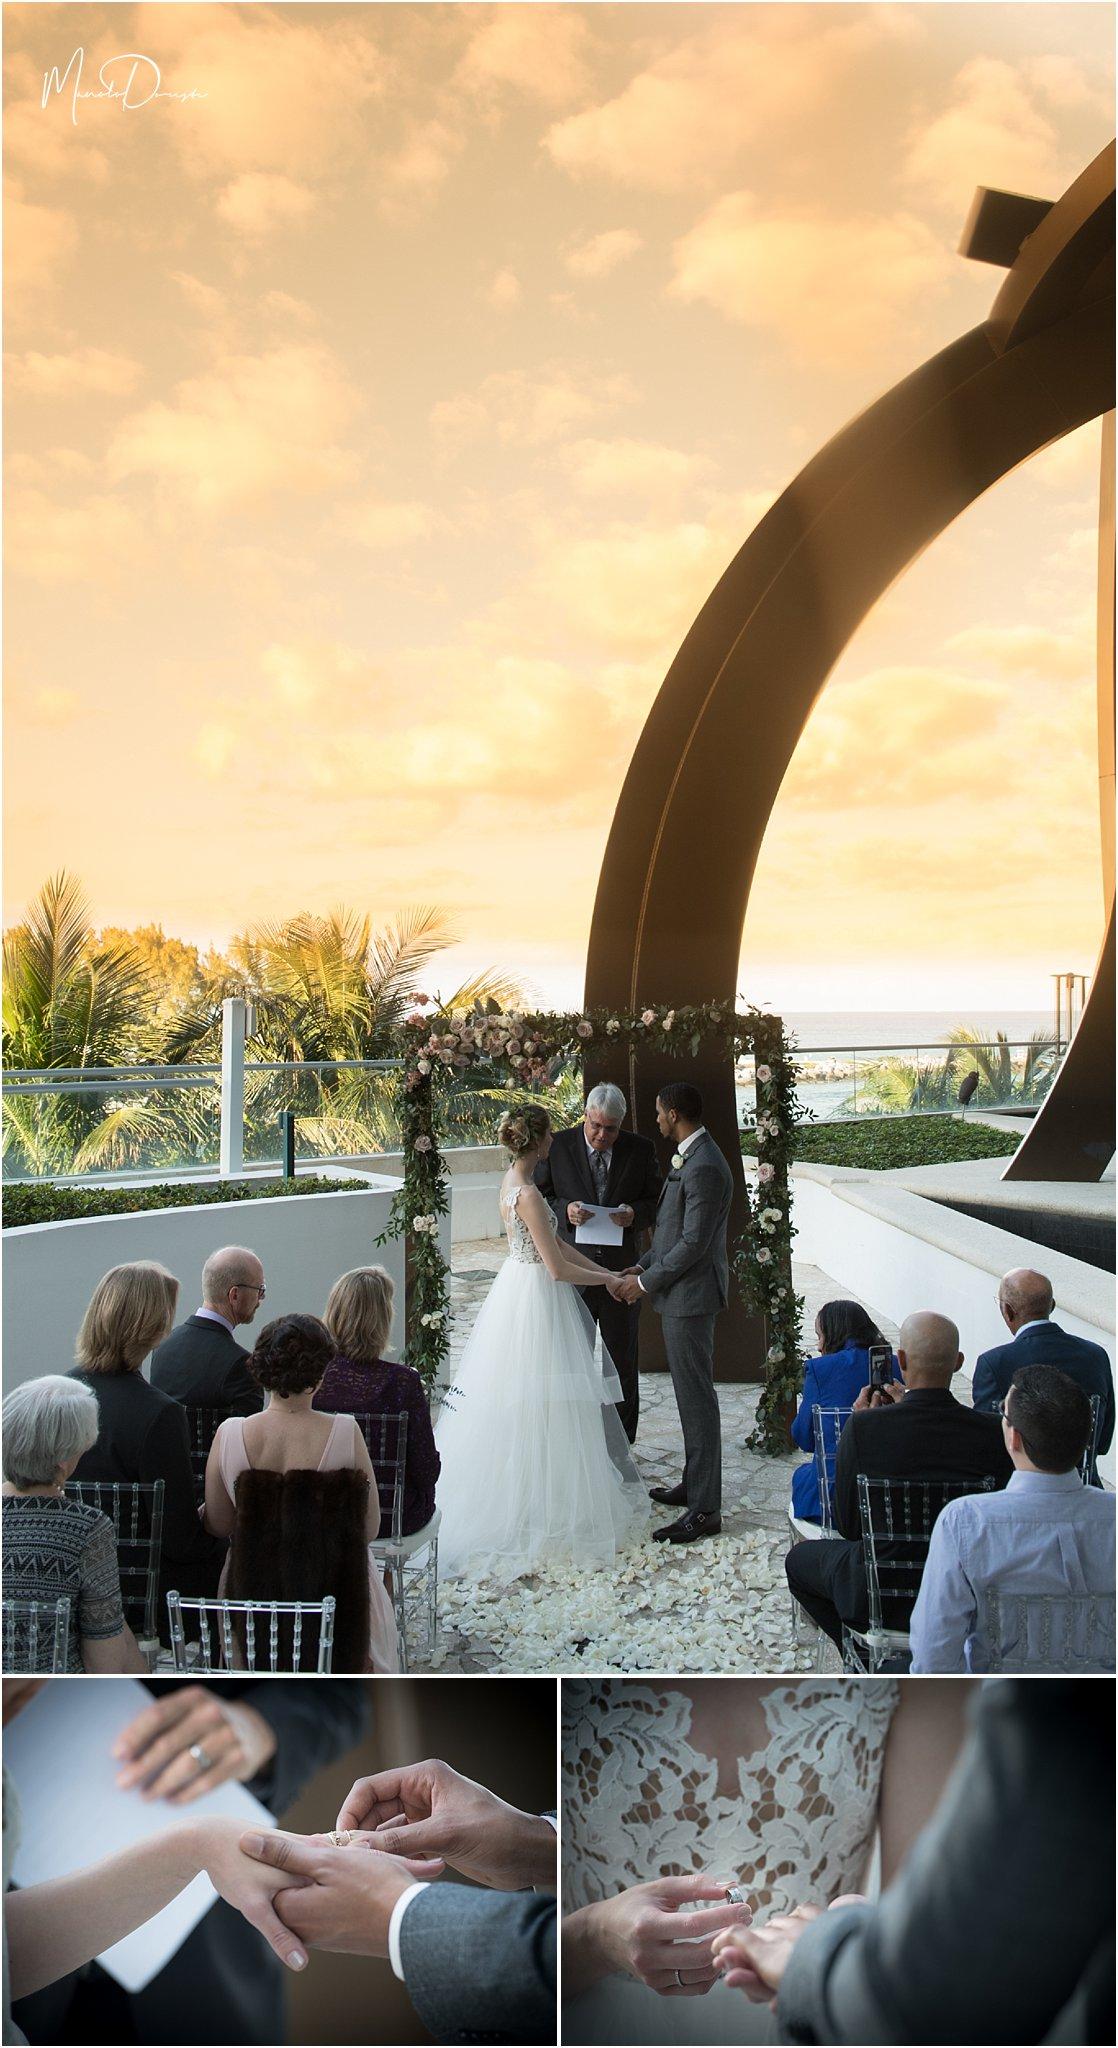 00884_ManoloDoreste_InFocusStudios_Wedding_Family_Photography_Miami_MiamiPhotographer.jpg